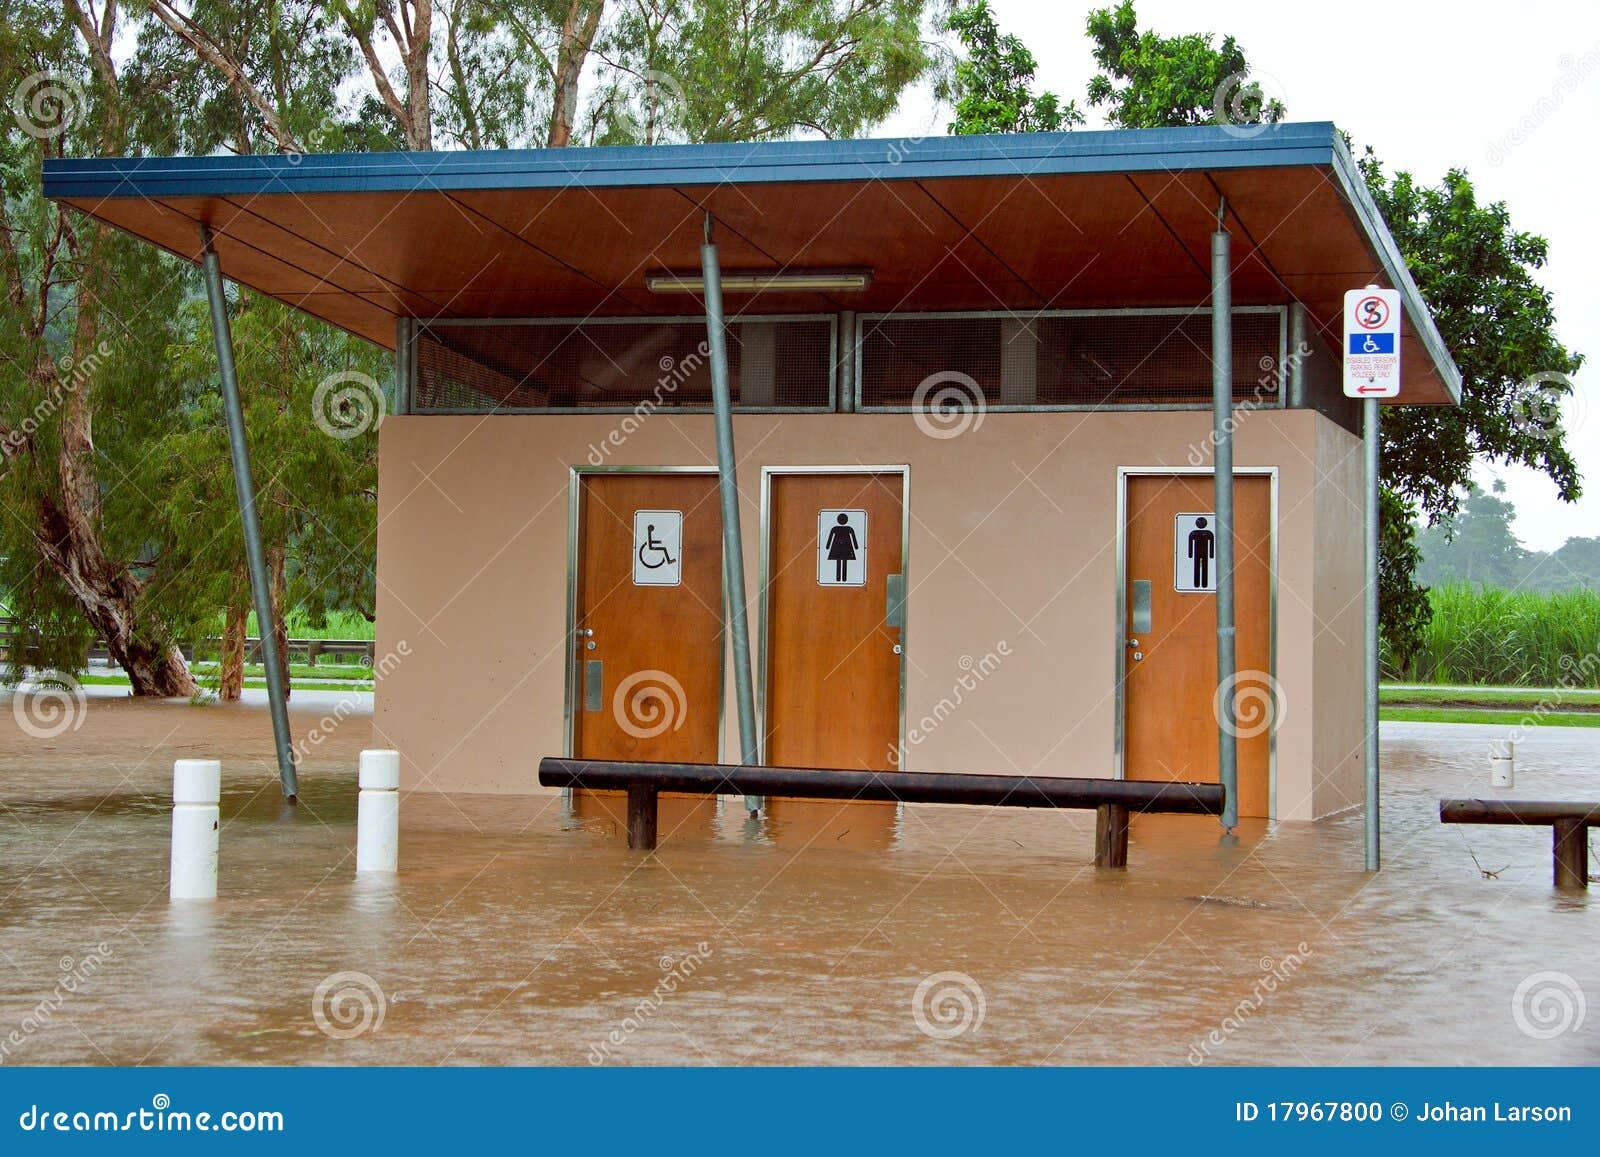 Public Toilets Flooded In Queensland Australia Stock